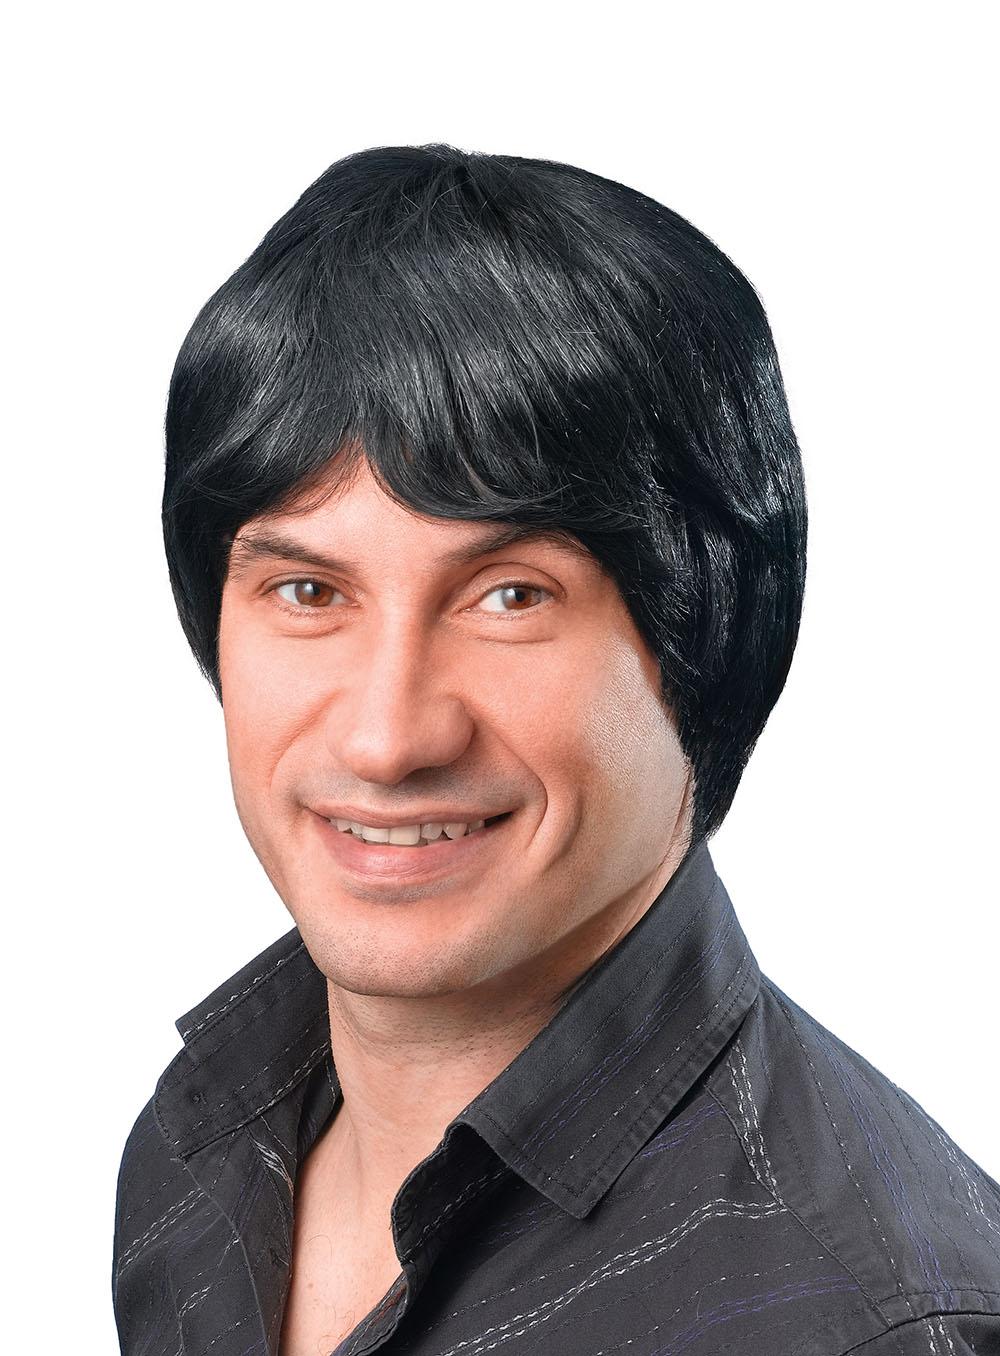 Wigs Uk Paypal 92